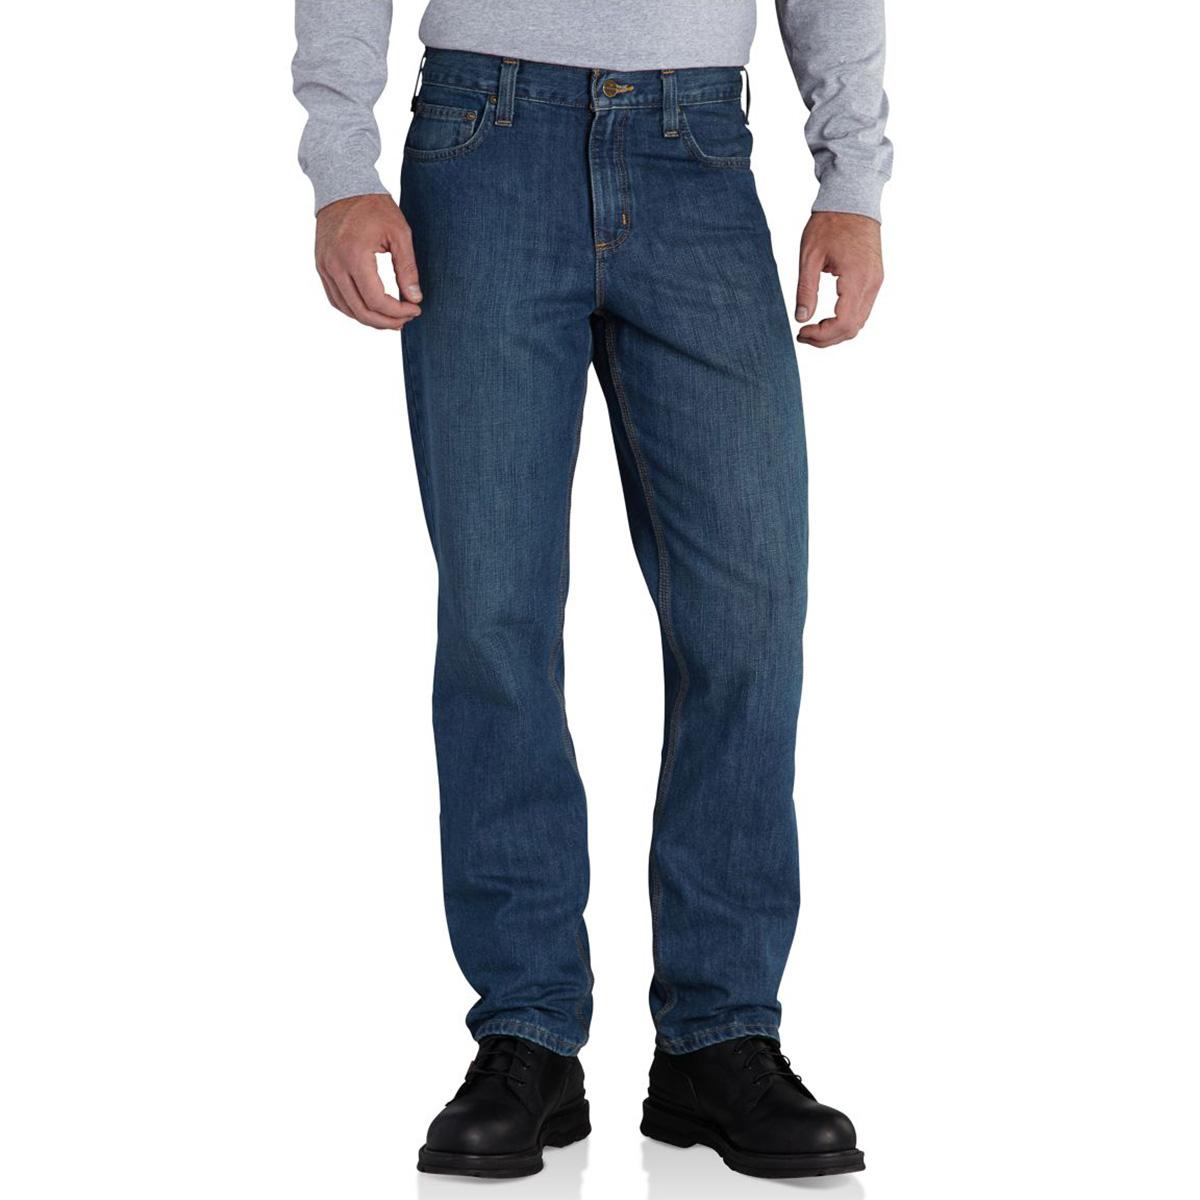 Carhartt Men's Elton Straight Fit Jeans - Blue, 33/36